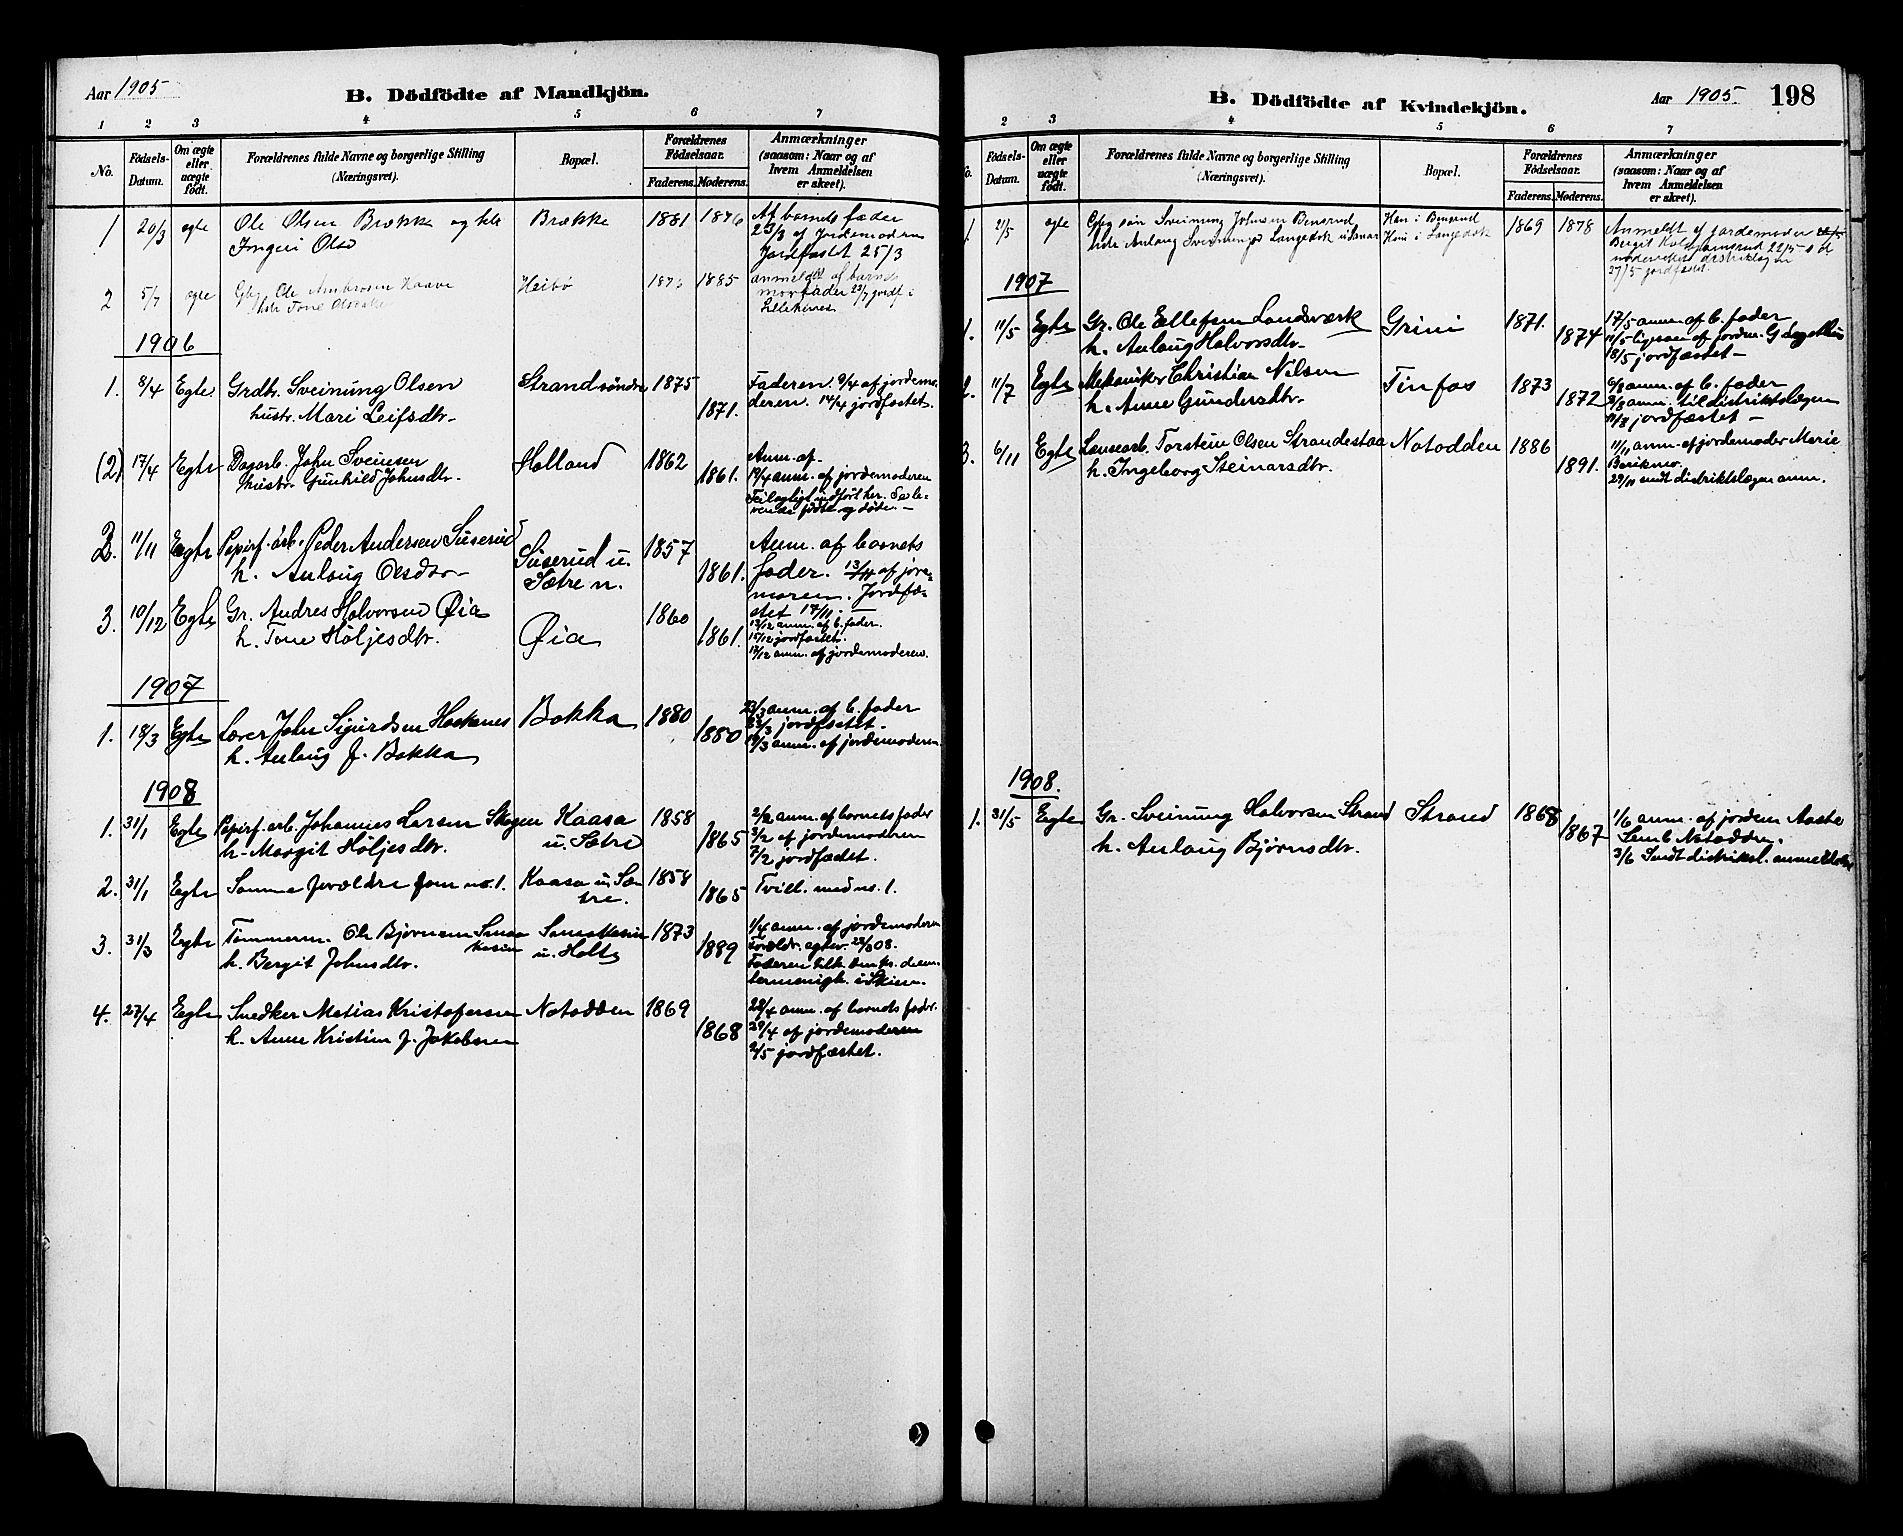 SAKO, Heddal kirkebøker, G/Ga/L0002: Klokkerbok nr. I 2, 1879-1908, s. 198